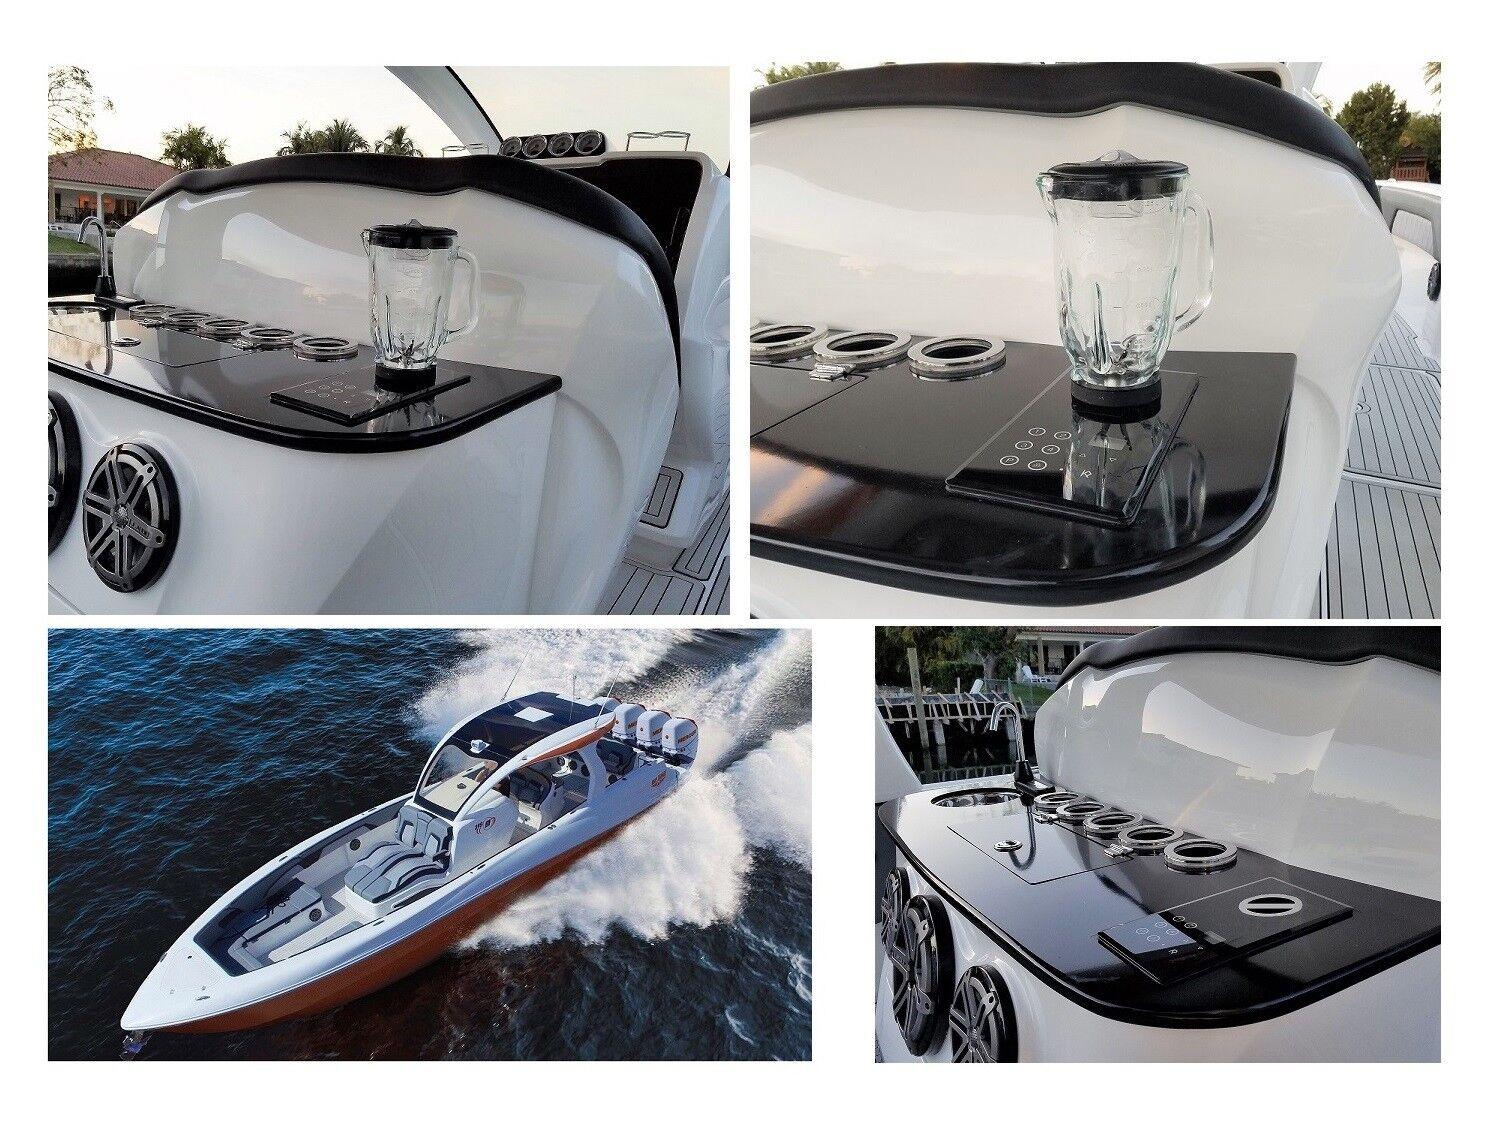 1000W BUILT-IN Blender + for RV-Boat & home. 110V NuTone Food Center 250,251